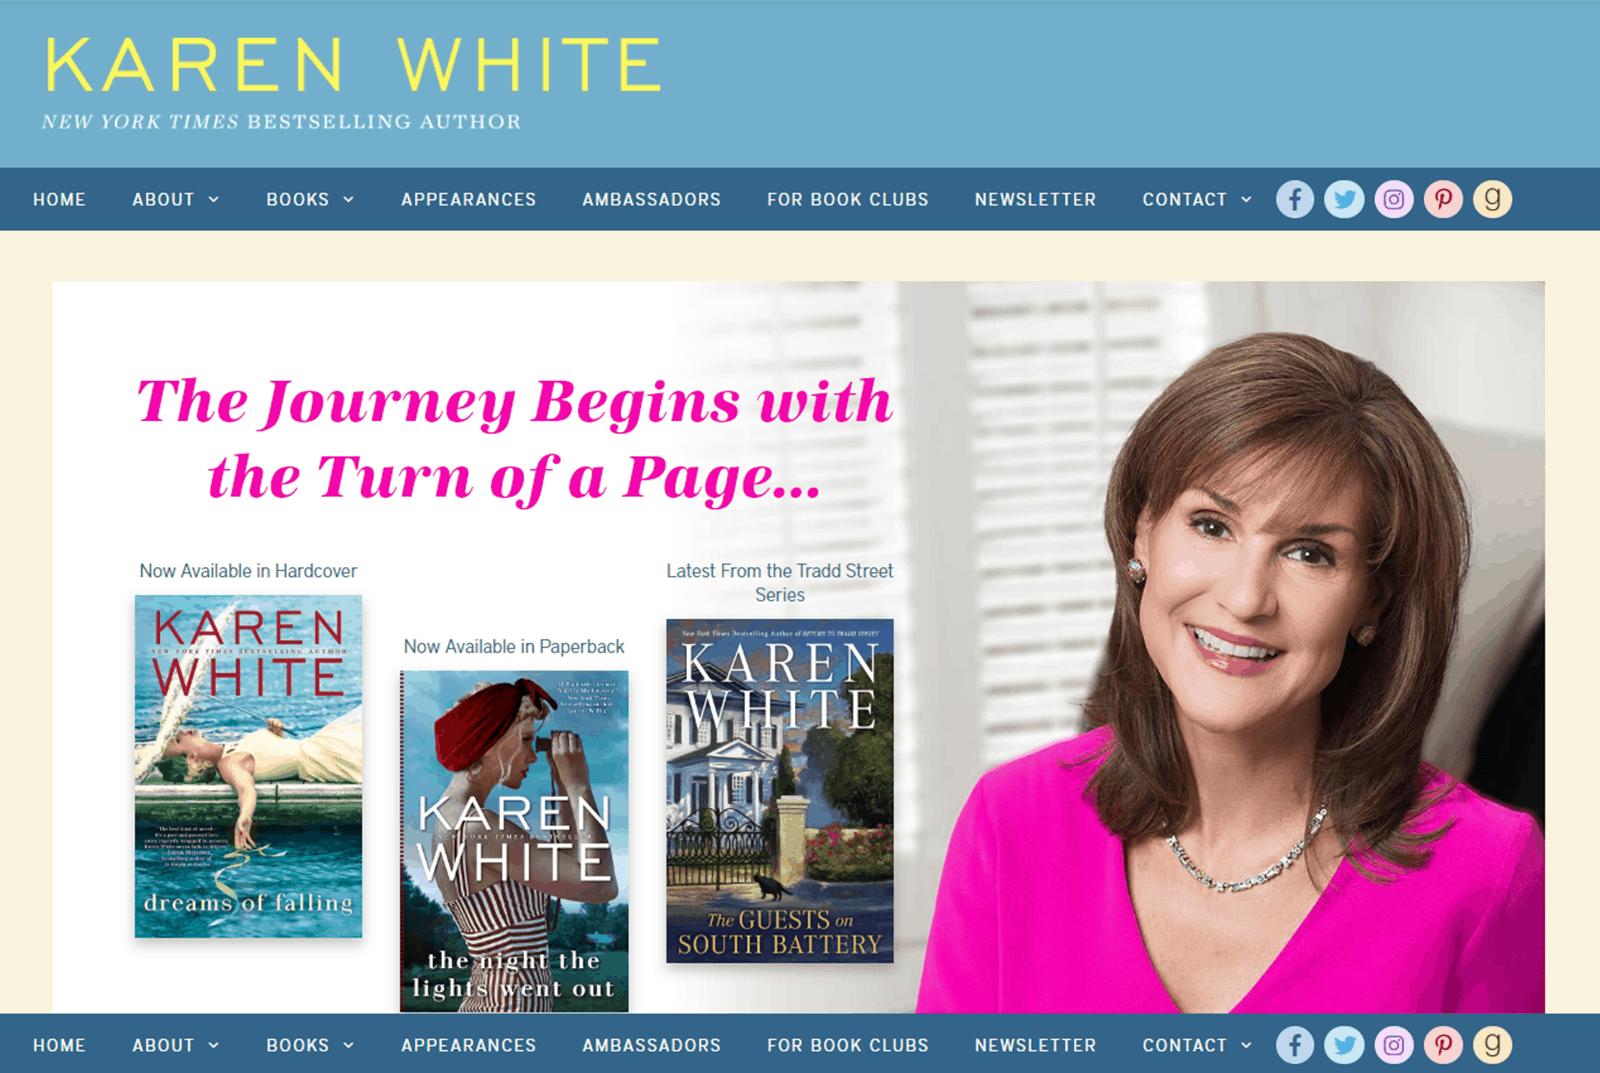 Karen White 2018 Website Update